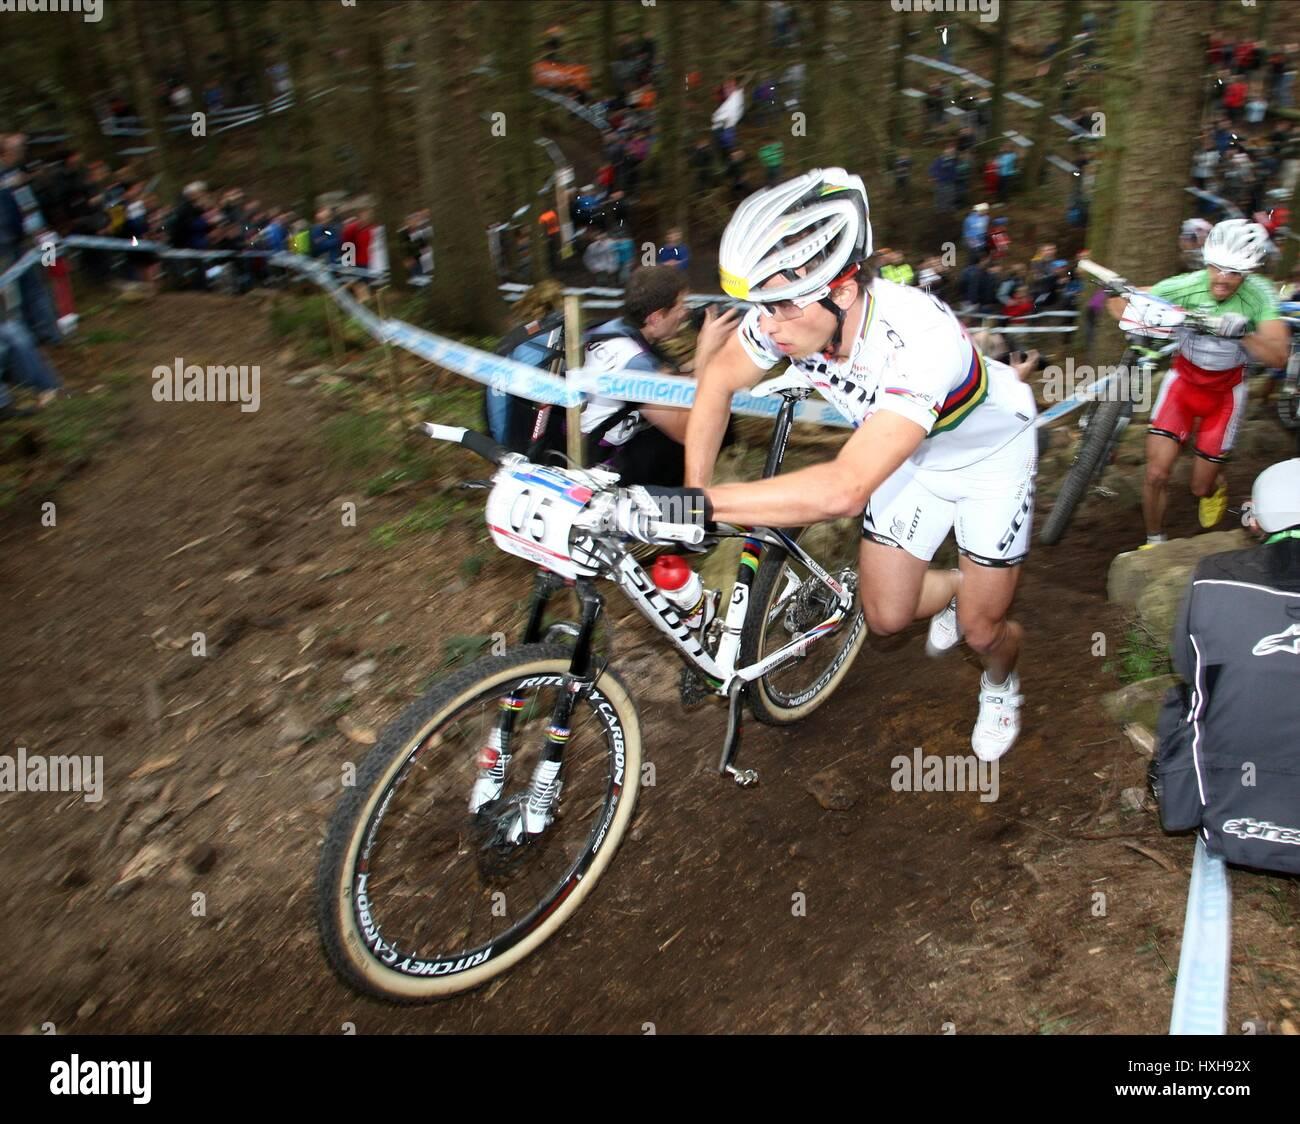 NINO SCHURTER UCI MOUNTAIN BIKE WORLD CUP DALBY FOREST YORKSHIRE ...